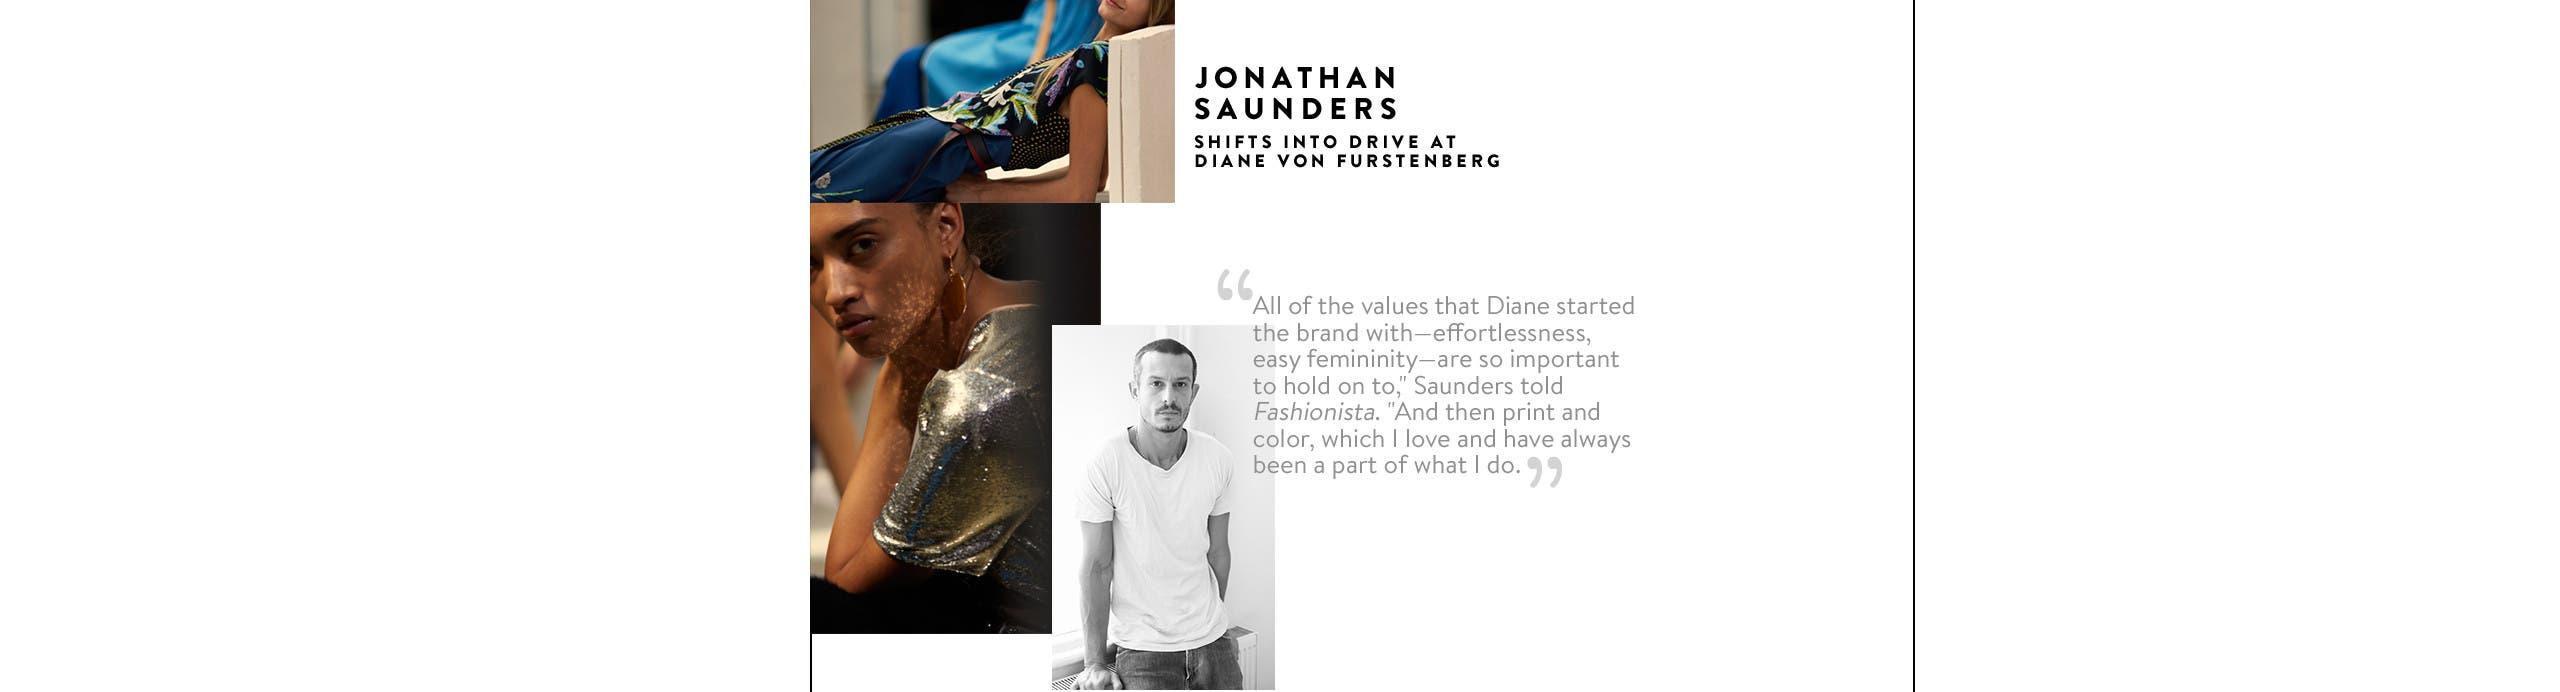 Jonathan Saunders shifts into drive at Diane von Furstenberg.